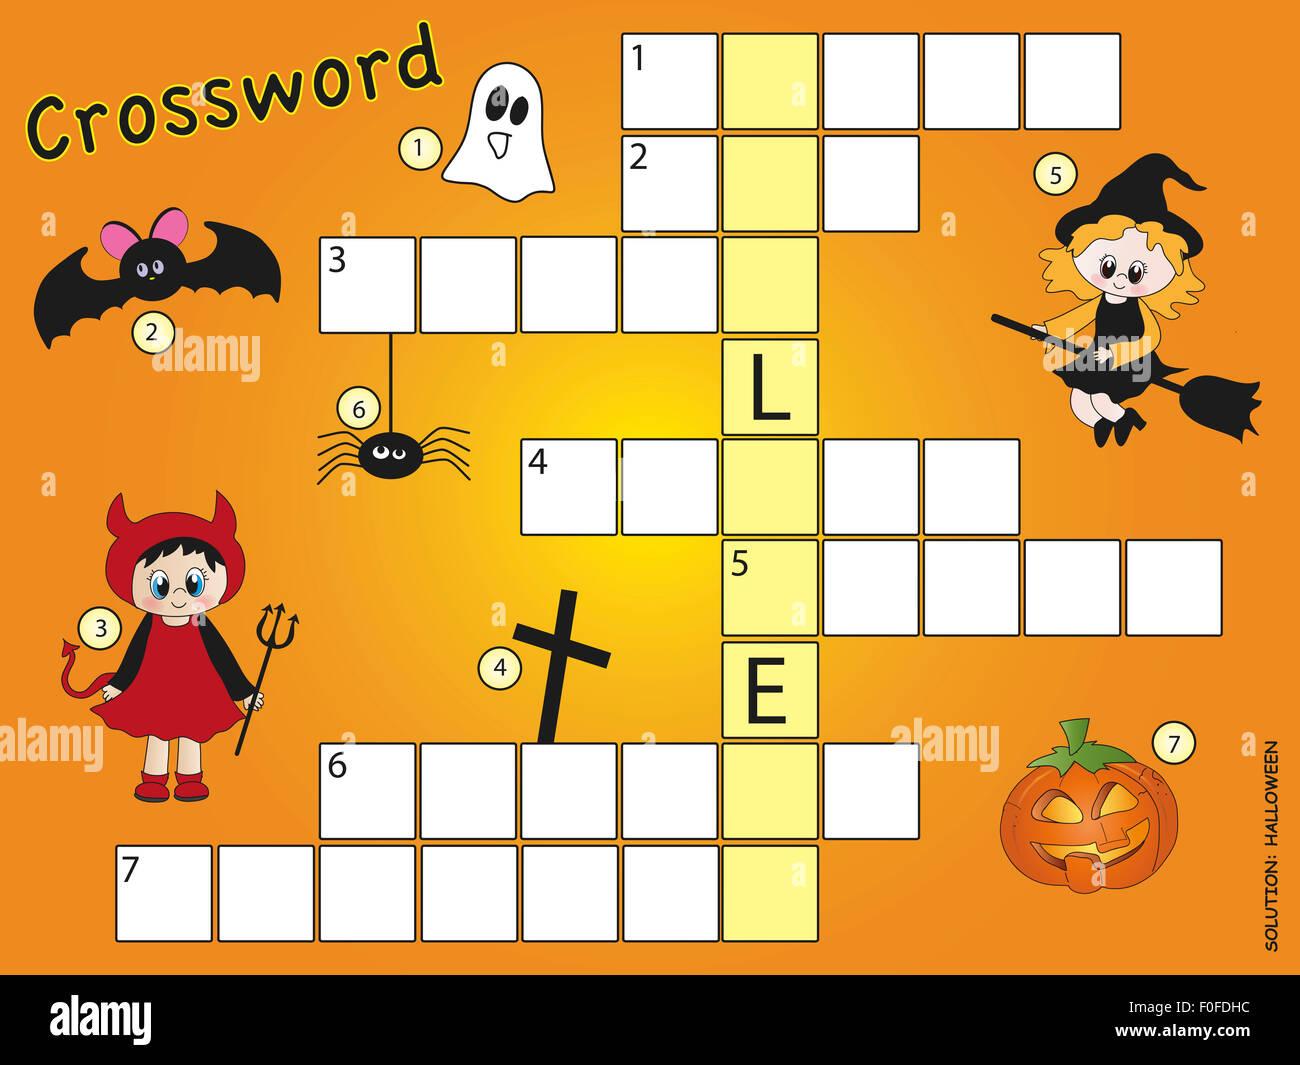 Halloween crossword game Stock Photo, Royalty Free Image: 86391800 ...